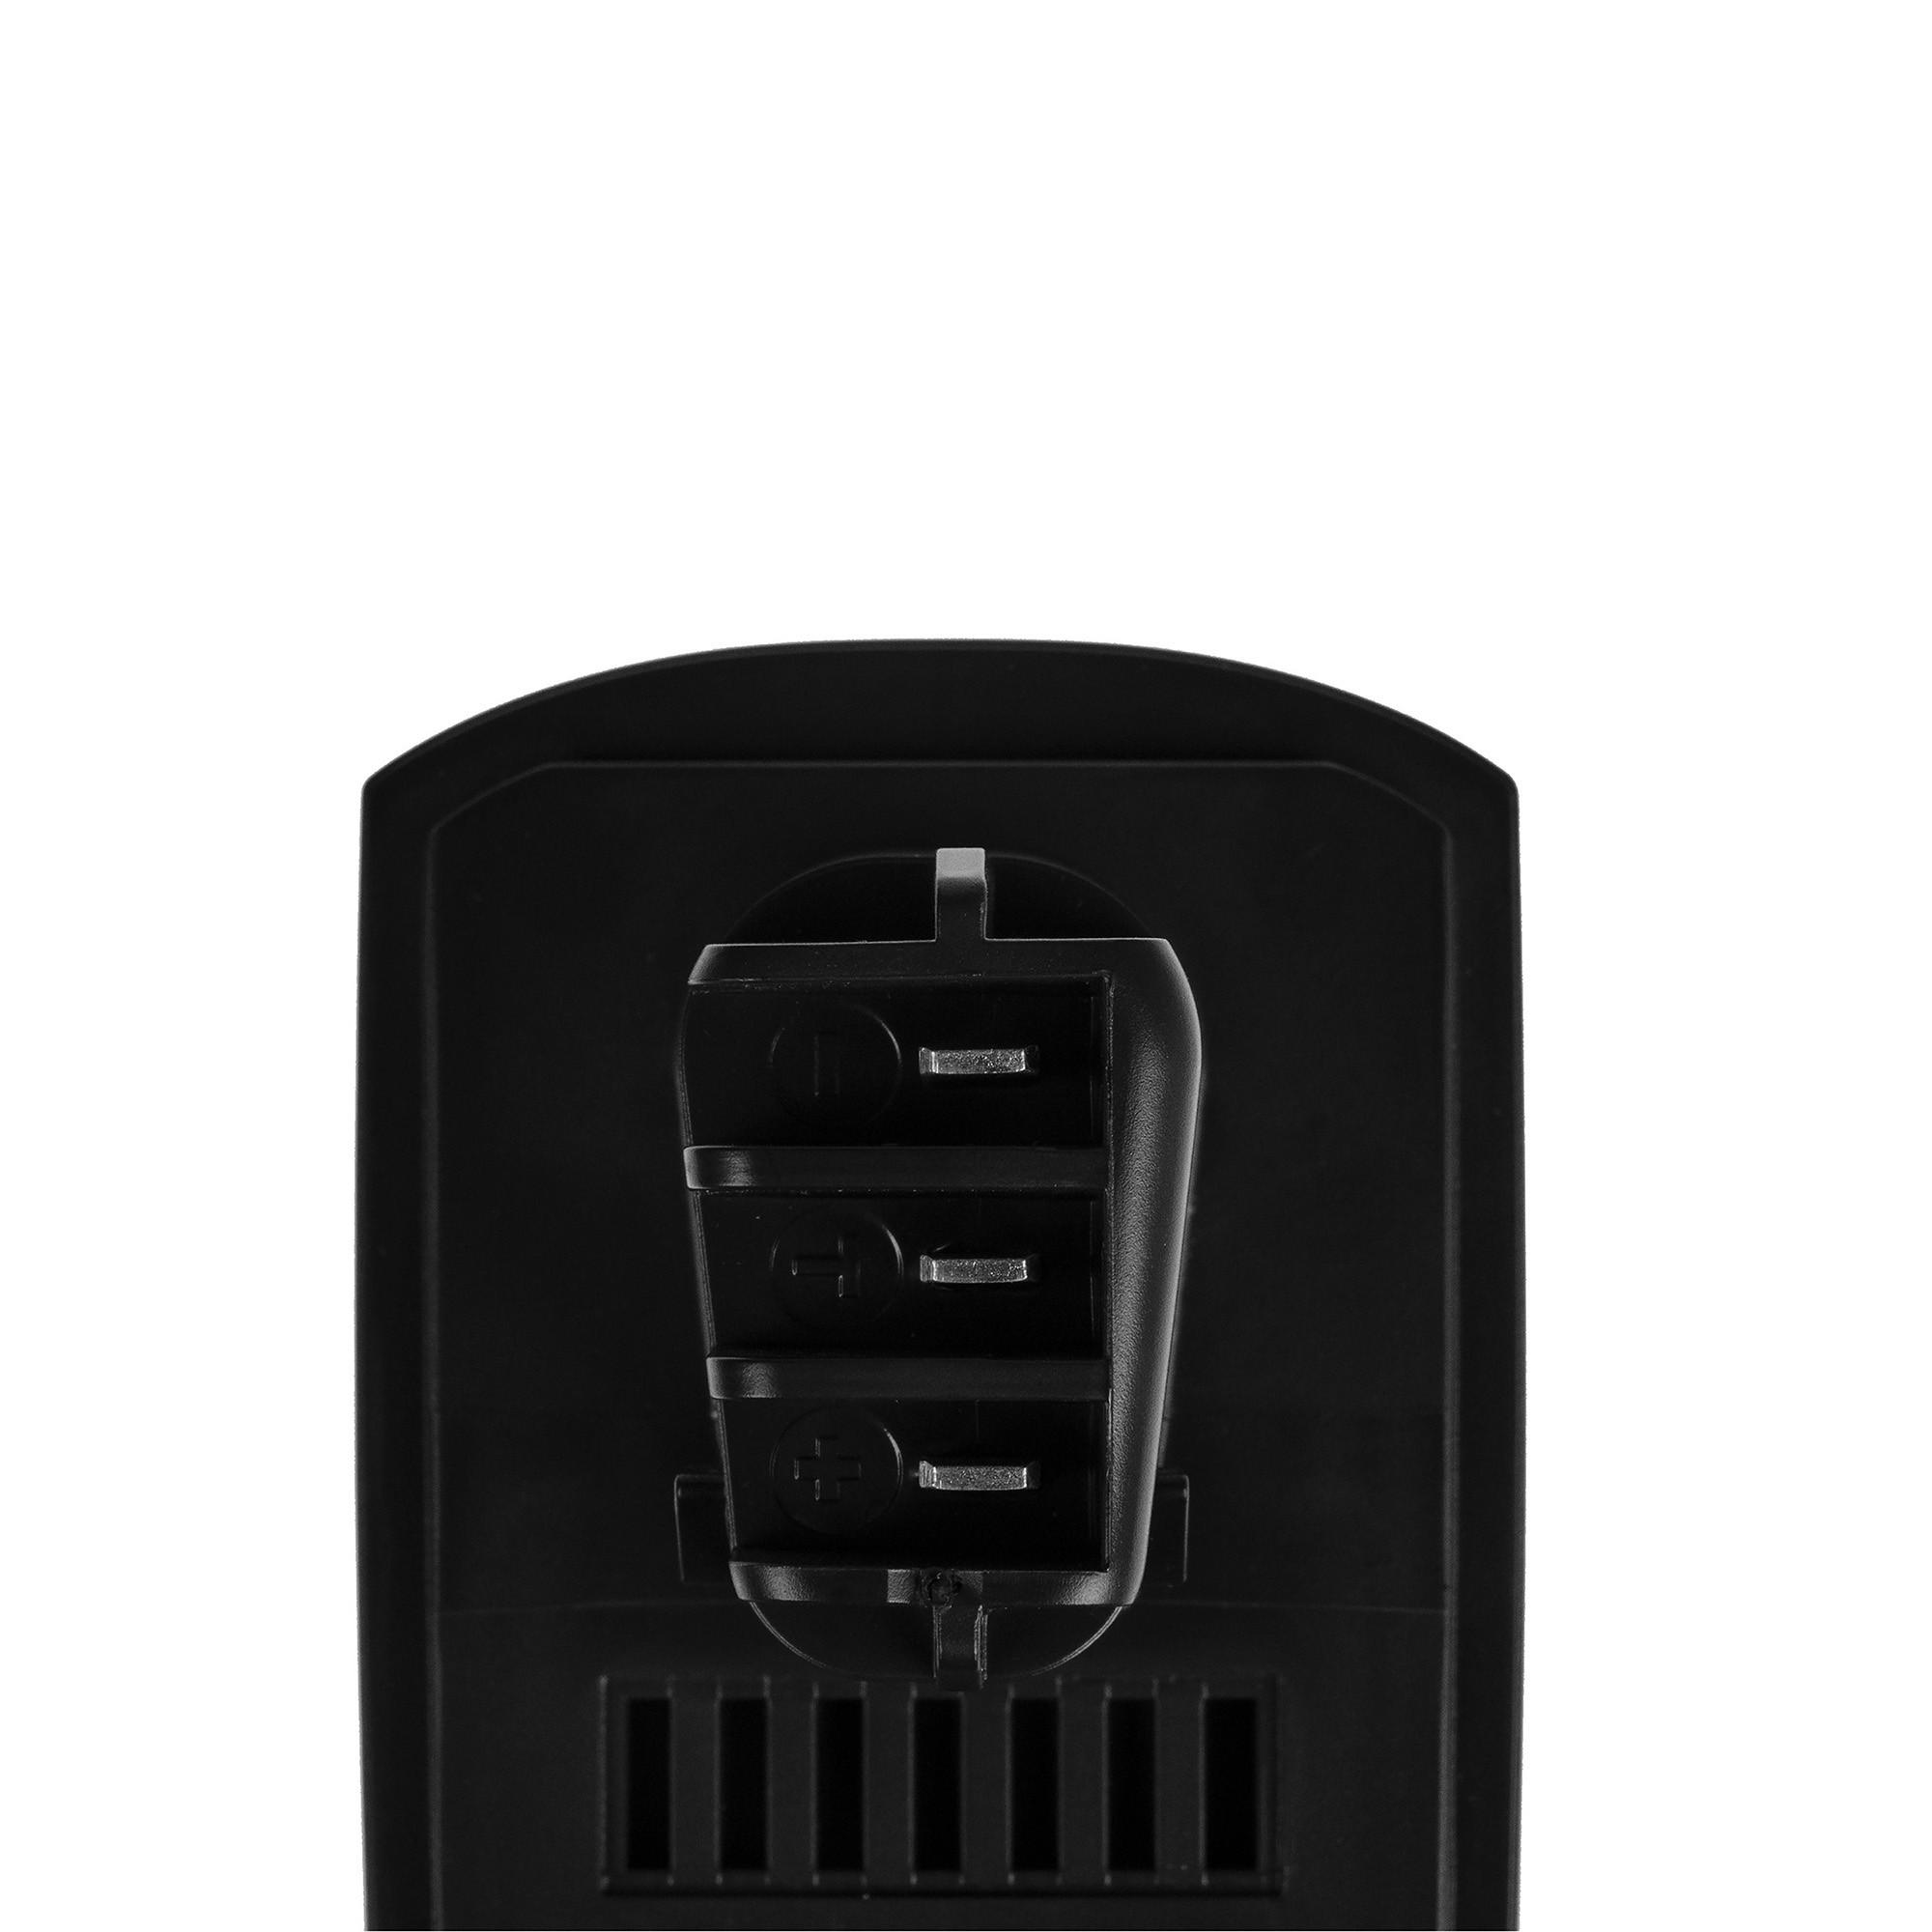 Green Cell Power Tool Battery 9.6V 2.1Ah for Metabo BS BST BSZ BZ 9.6 Impuls SP ULA 9.6-18